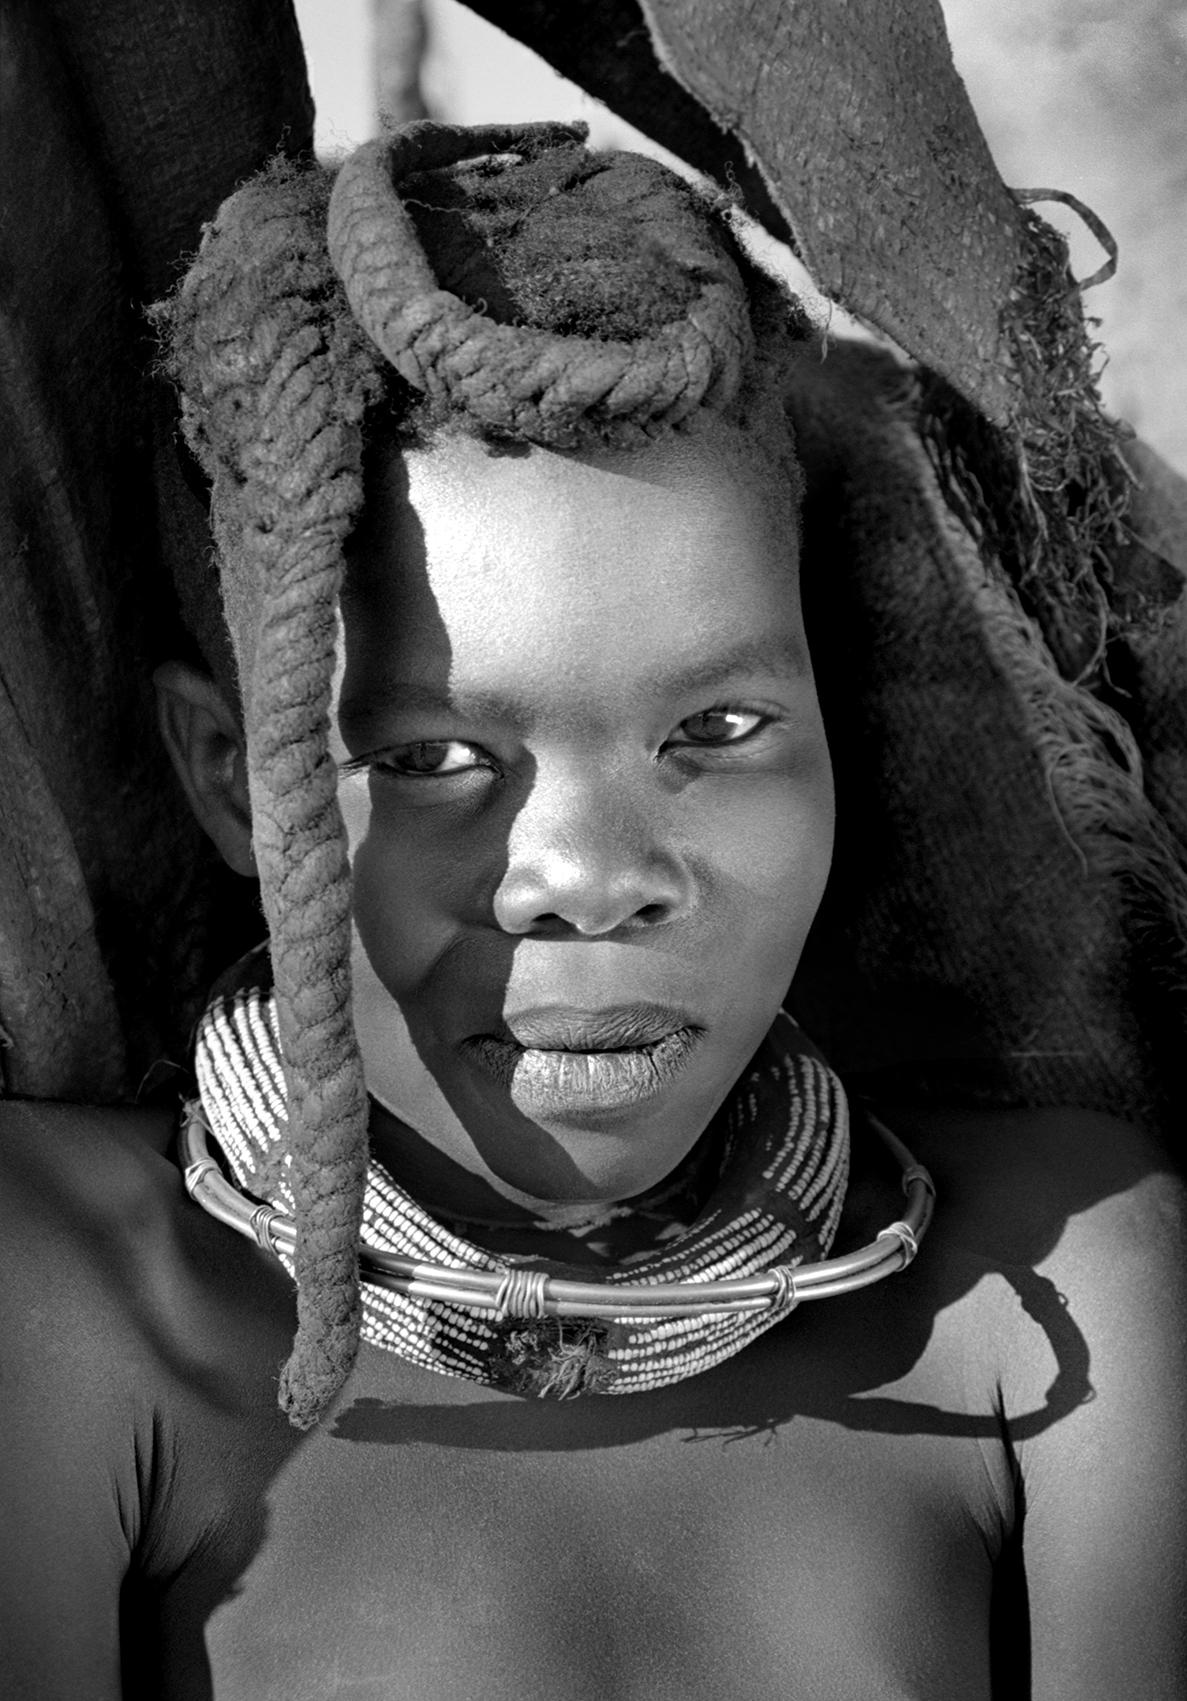 Rina_Sherman_For a While_Katjiaambia's Child_06.jpg